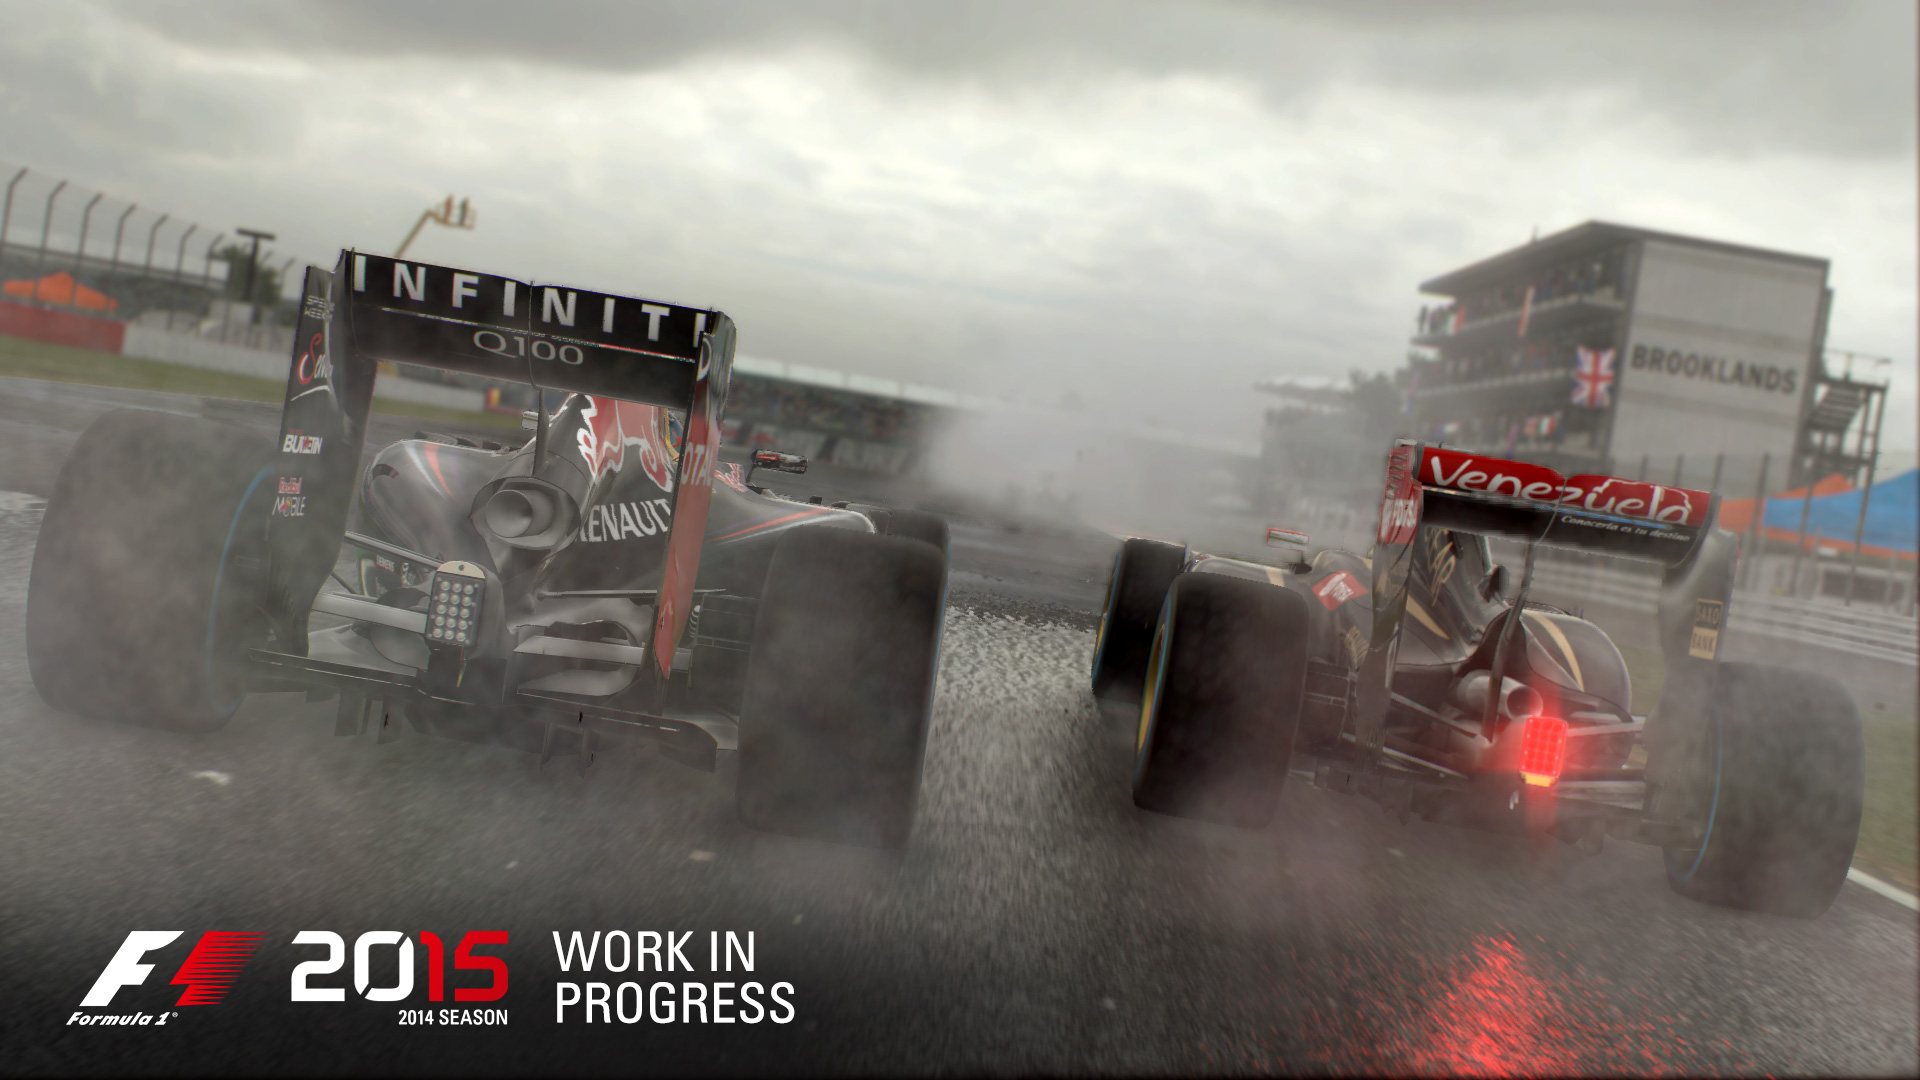 F1 2015 Xbox One, PS4, PC Promises